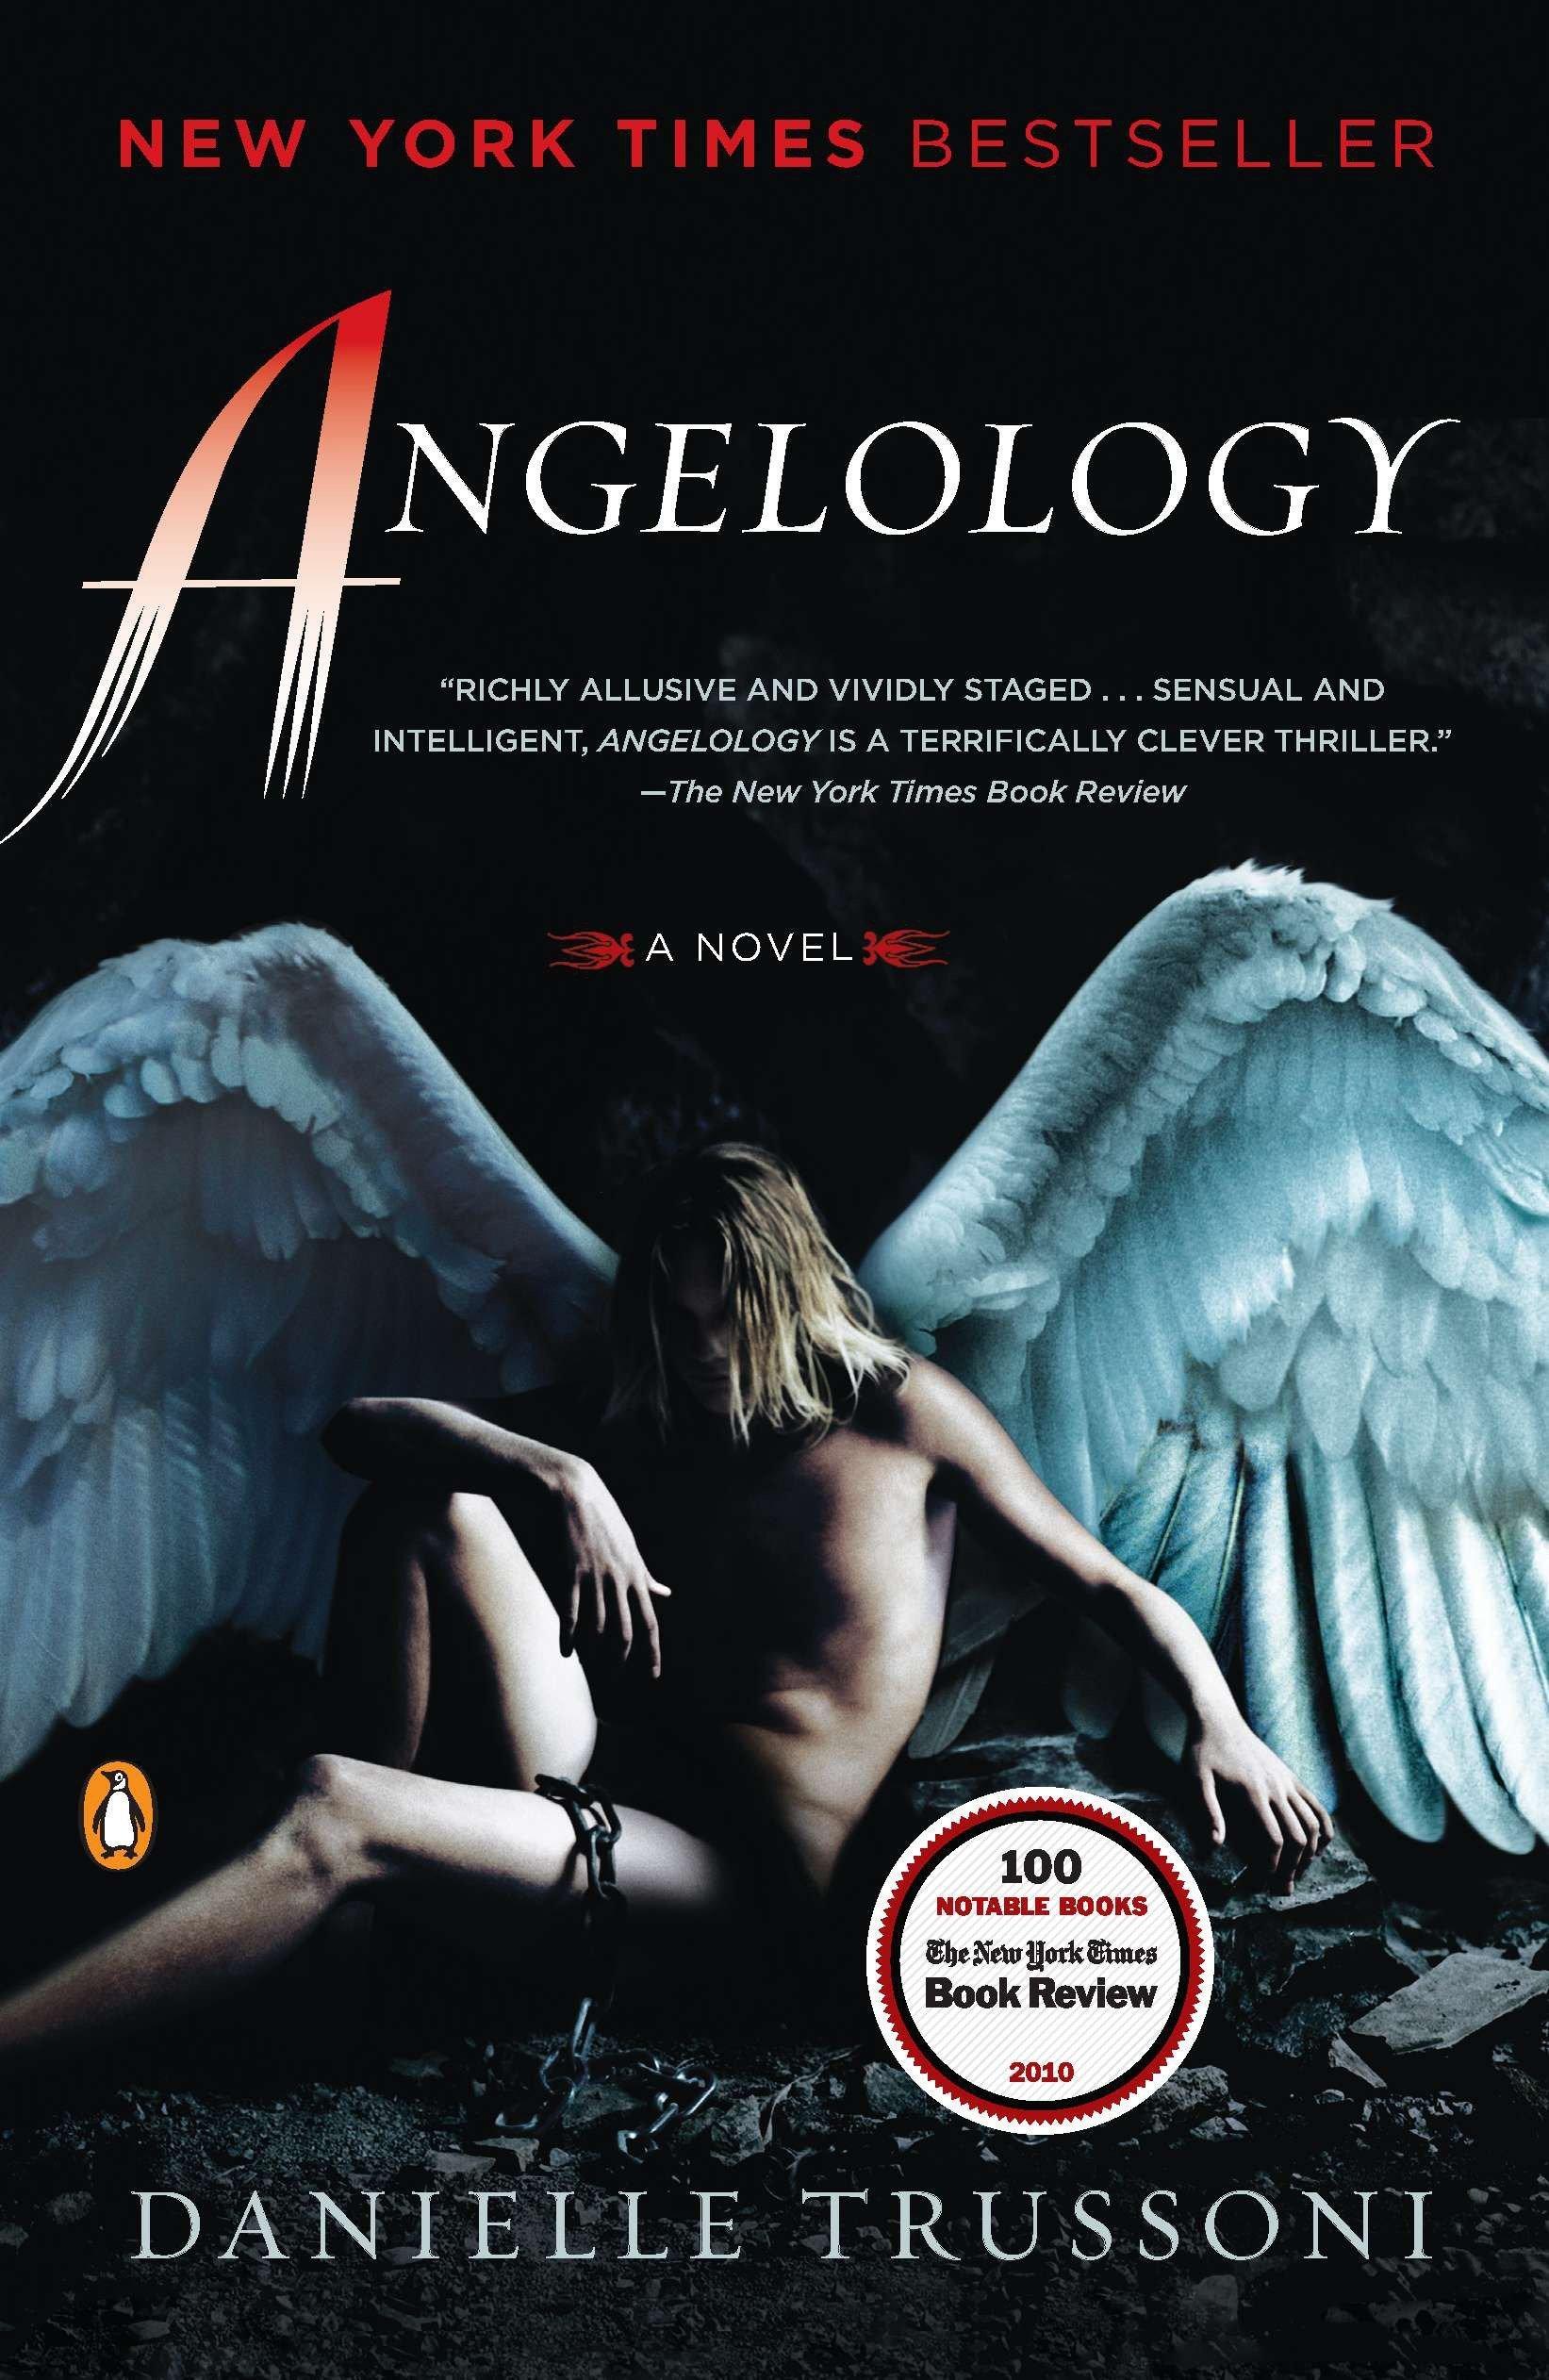 Review: Book Z A Novel